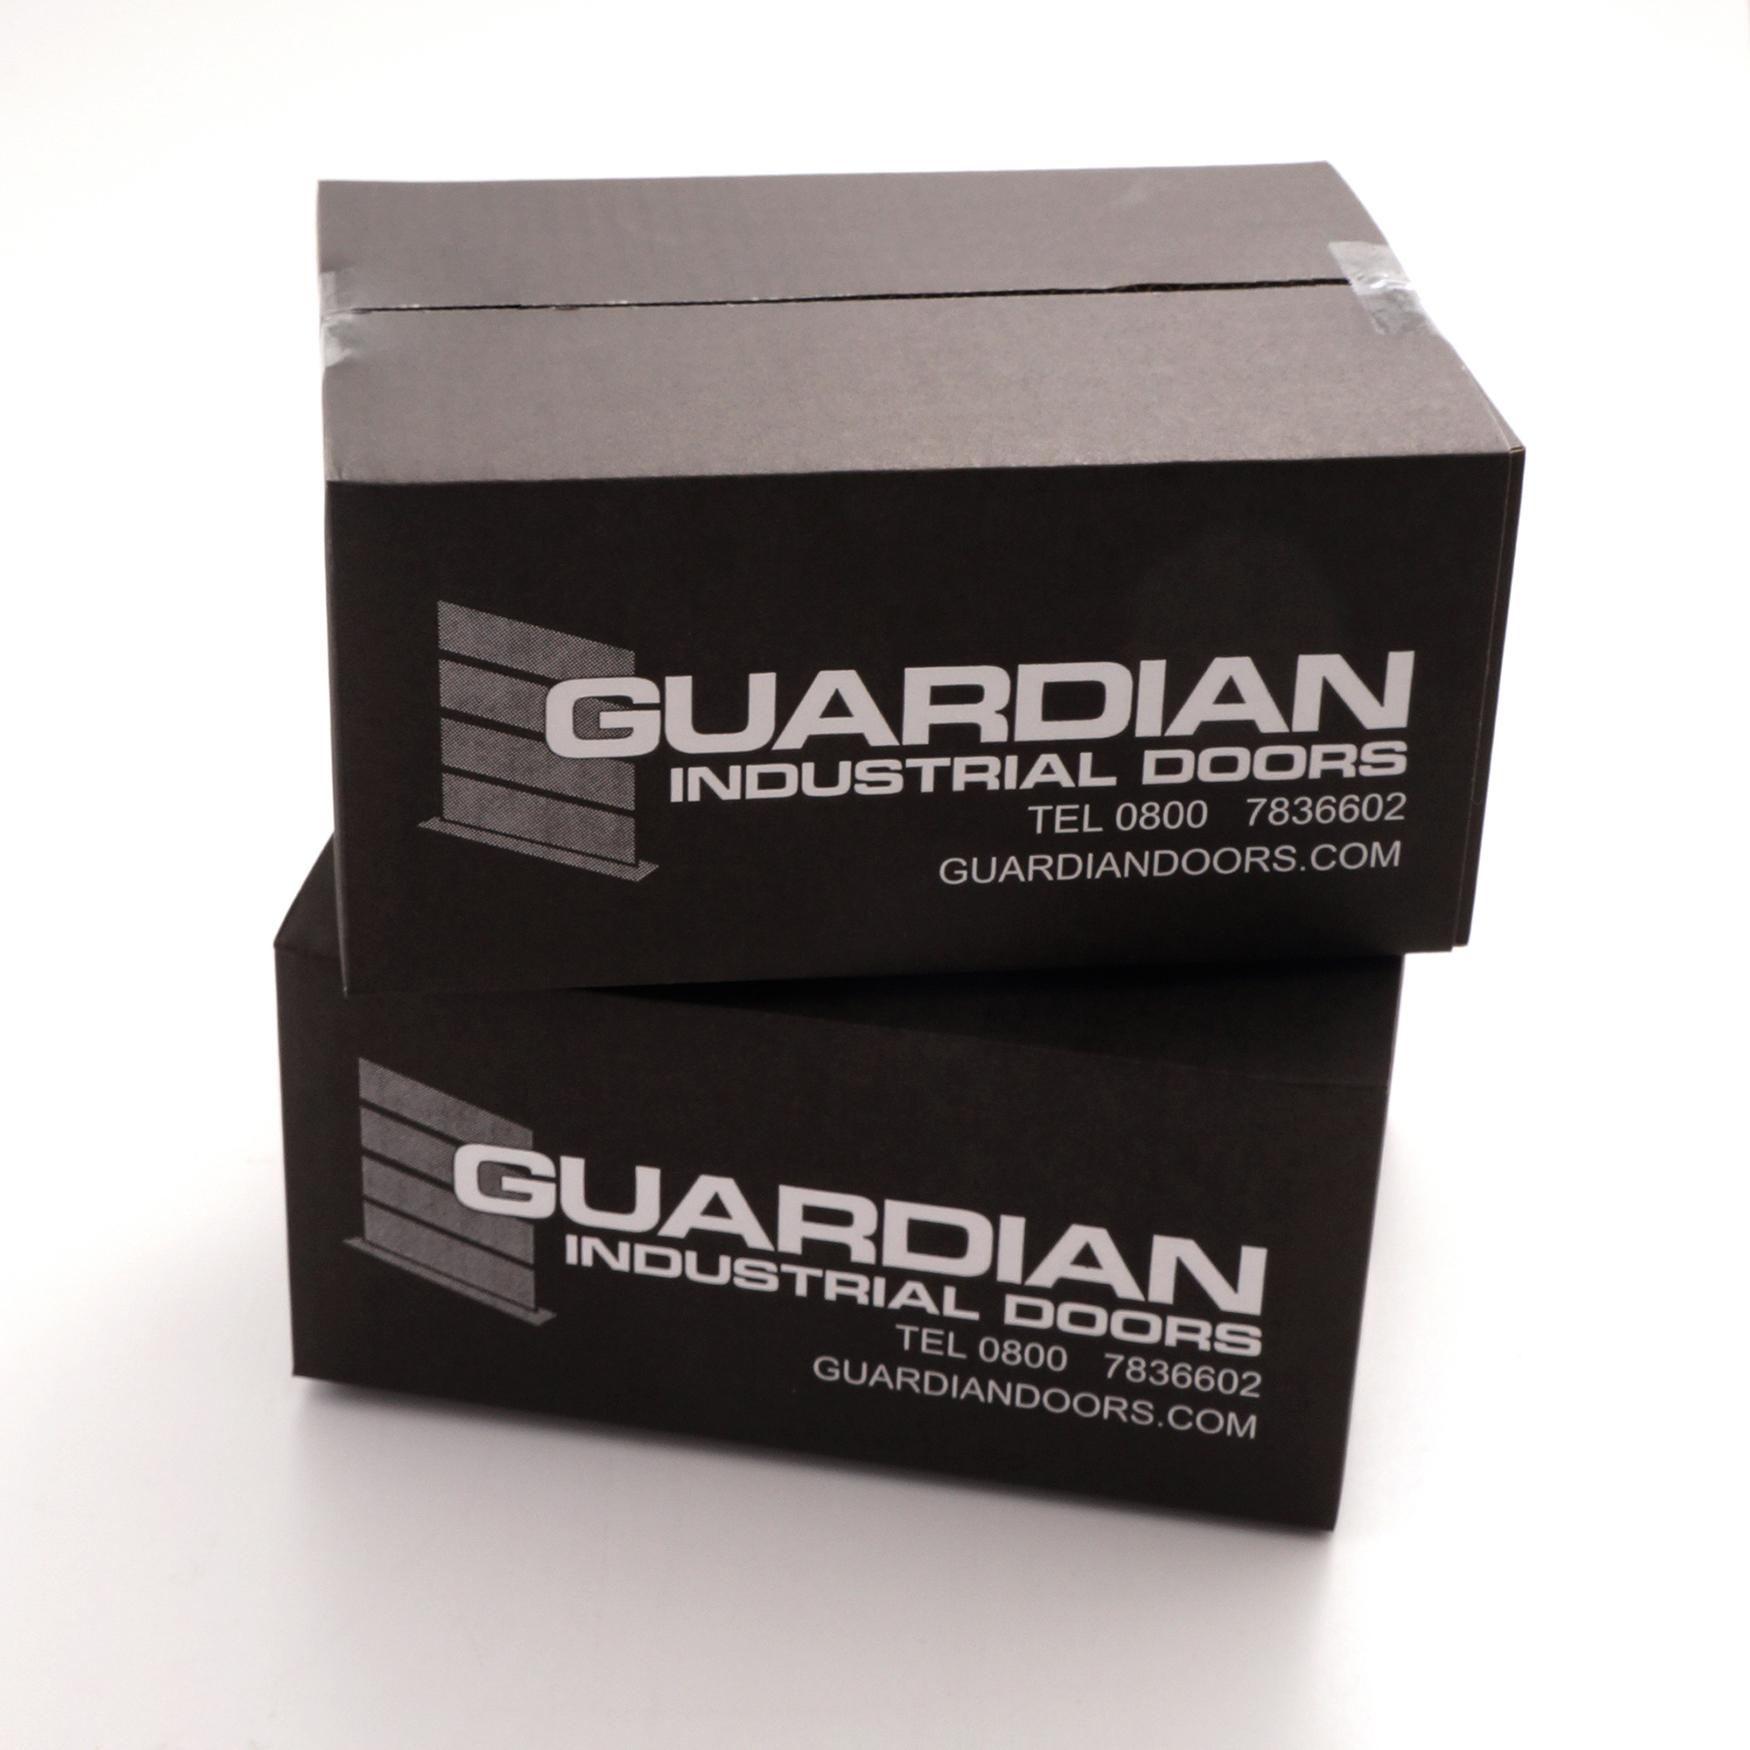 GuardianDoors